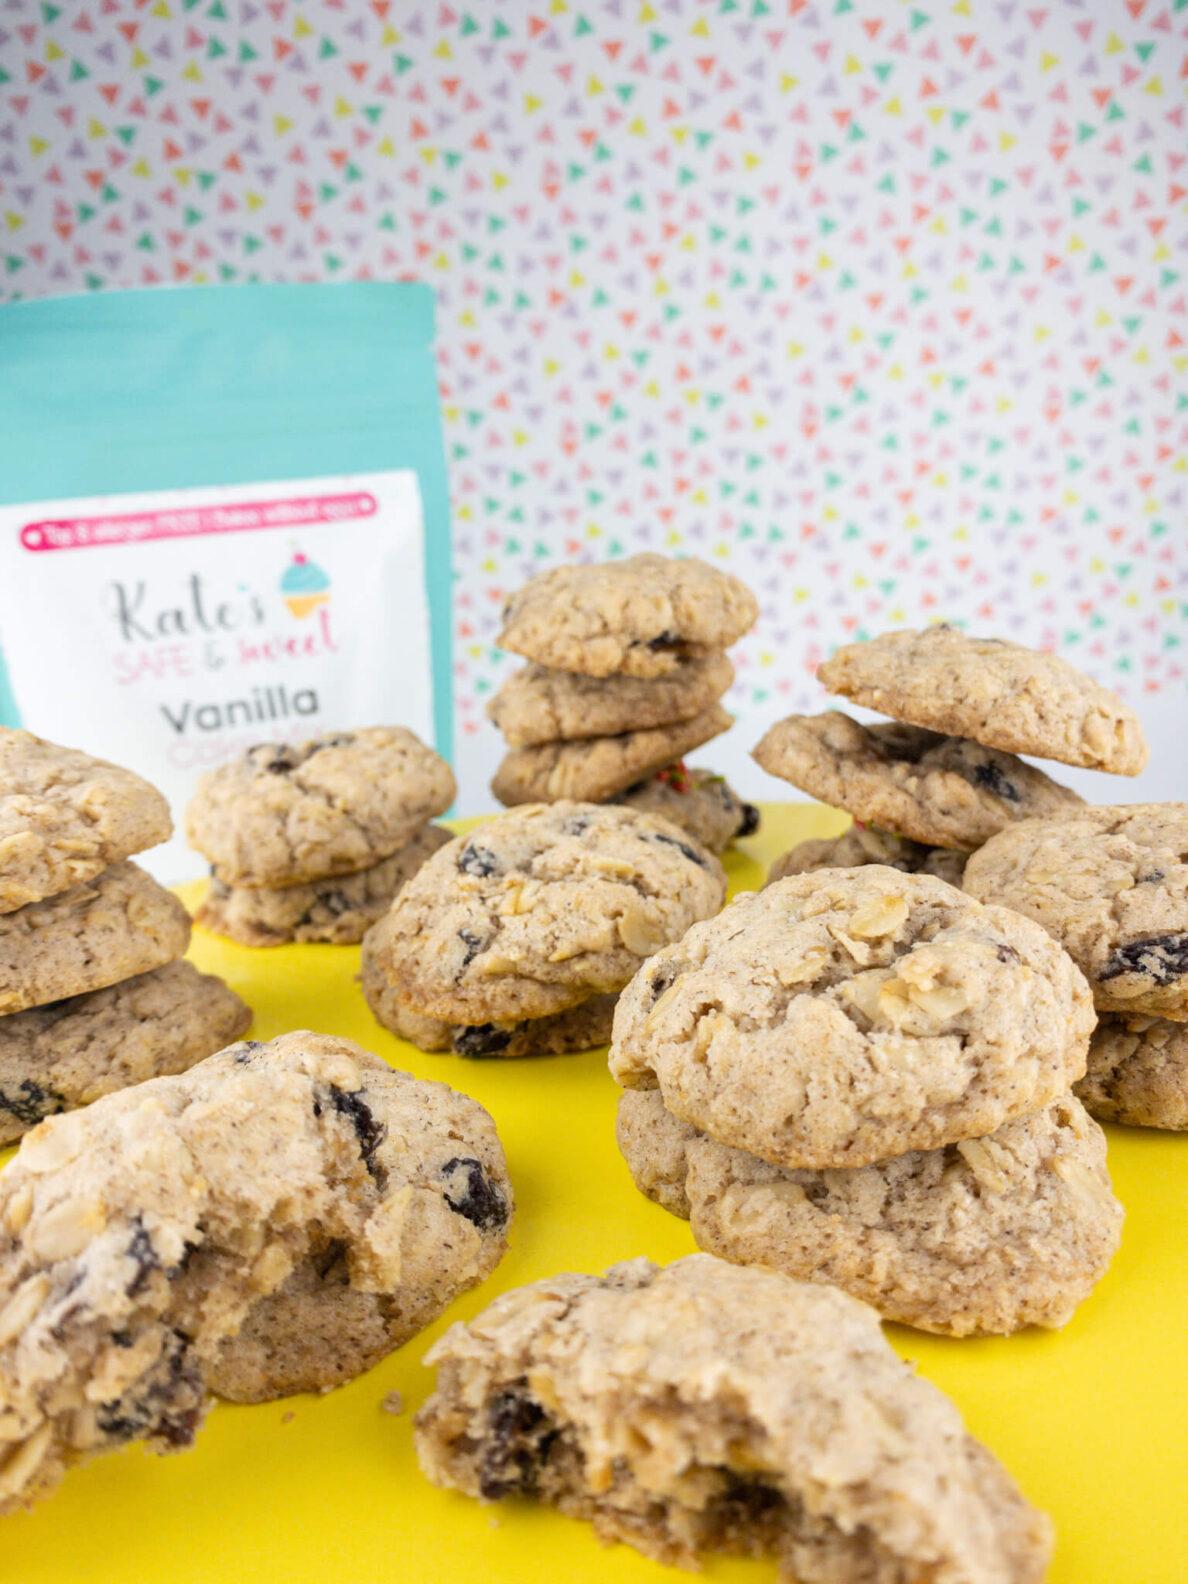 Kate's Safe and Sweet - Oatmeal Raisin Cookies